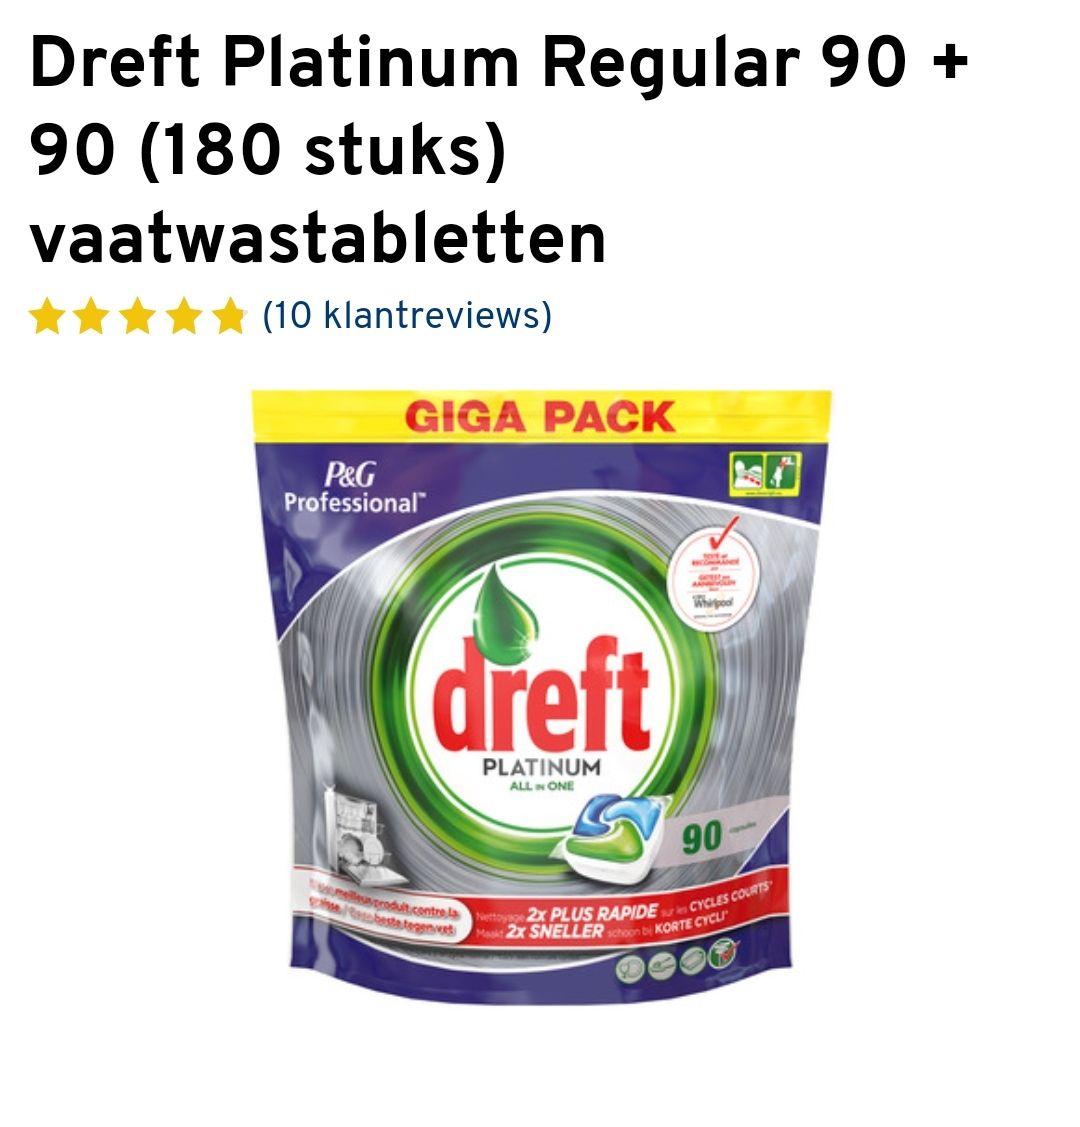 Dreft platinum 1+1, 180 stuks vaatwas tabletten